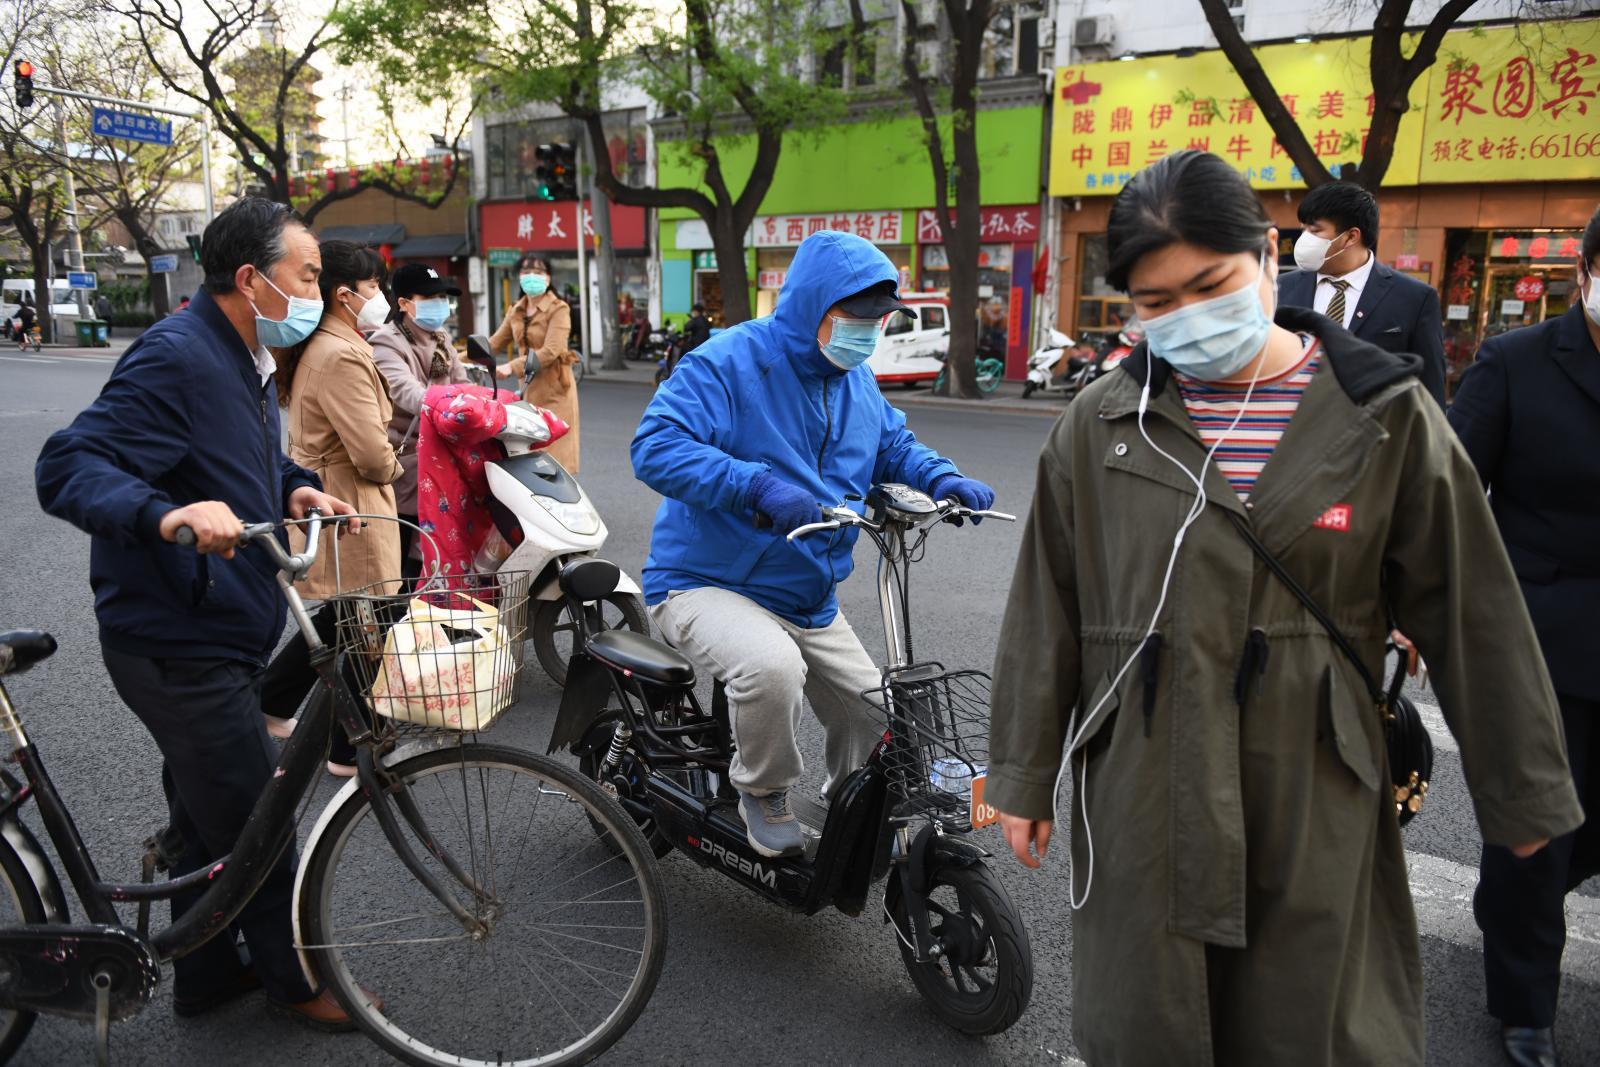 WHO ป้องจีนแก้ไขตัวเลขโควิด-19 เพื่อไม่ให้ตกหล่น